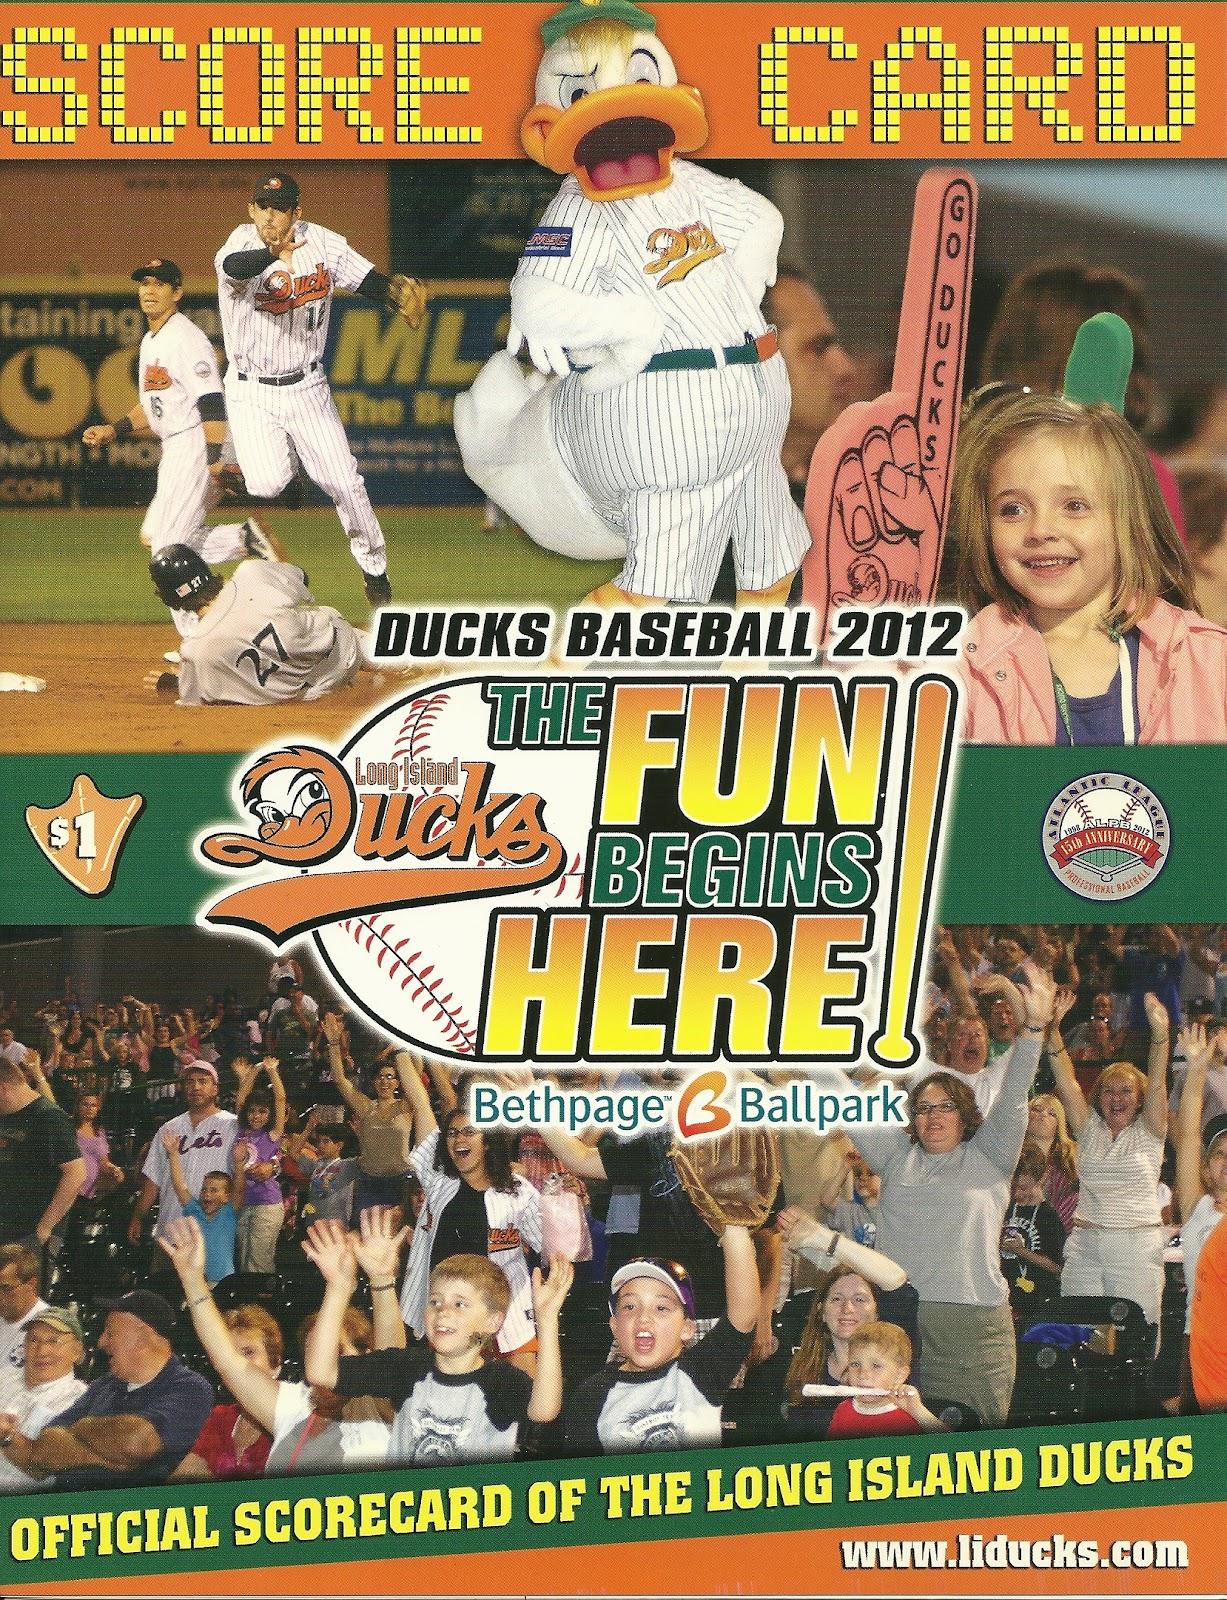 Long Island Ducks Game Score